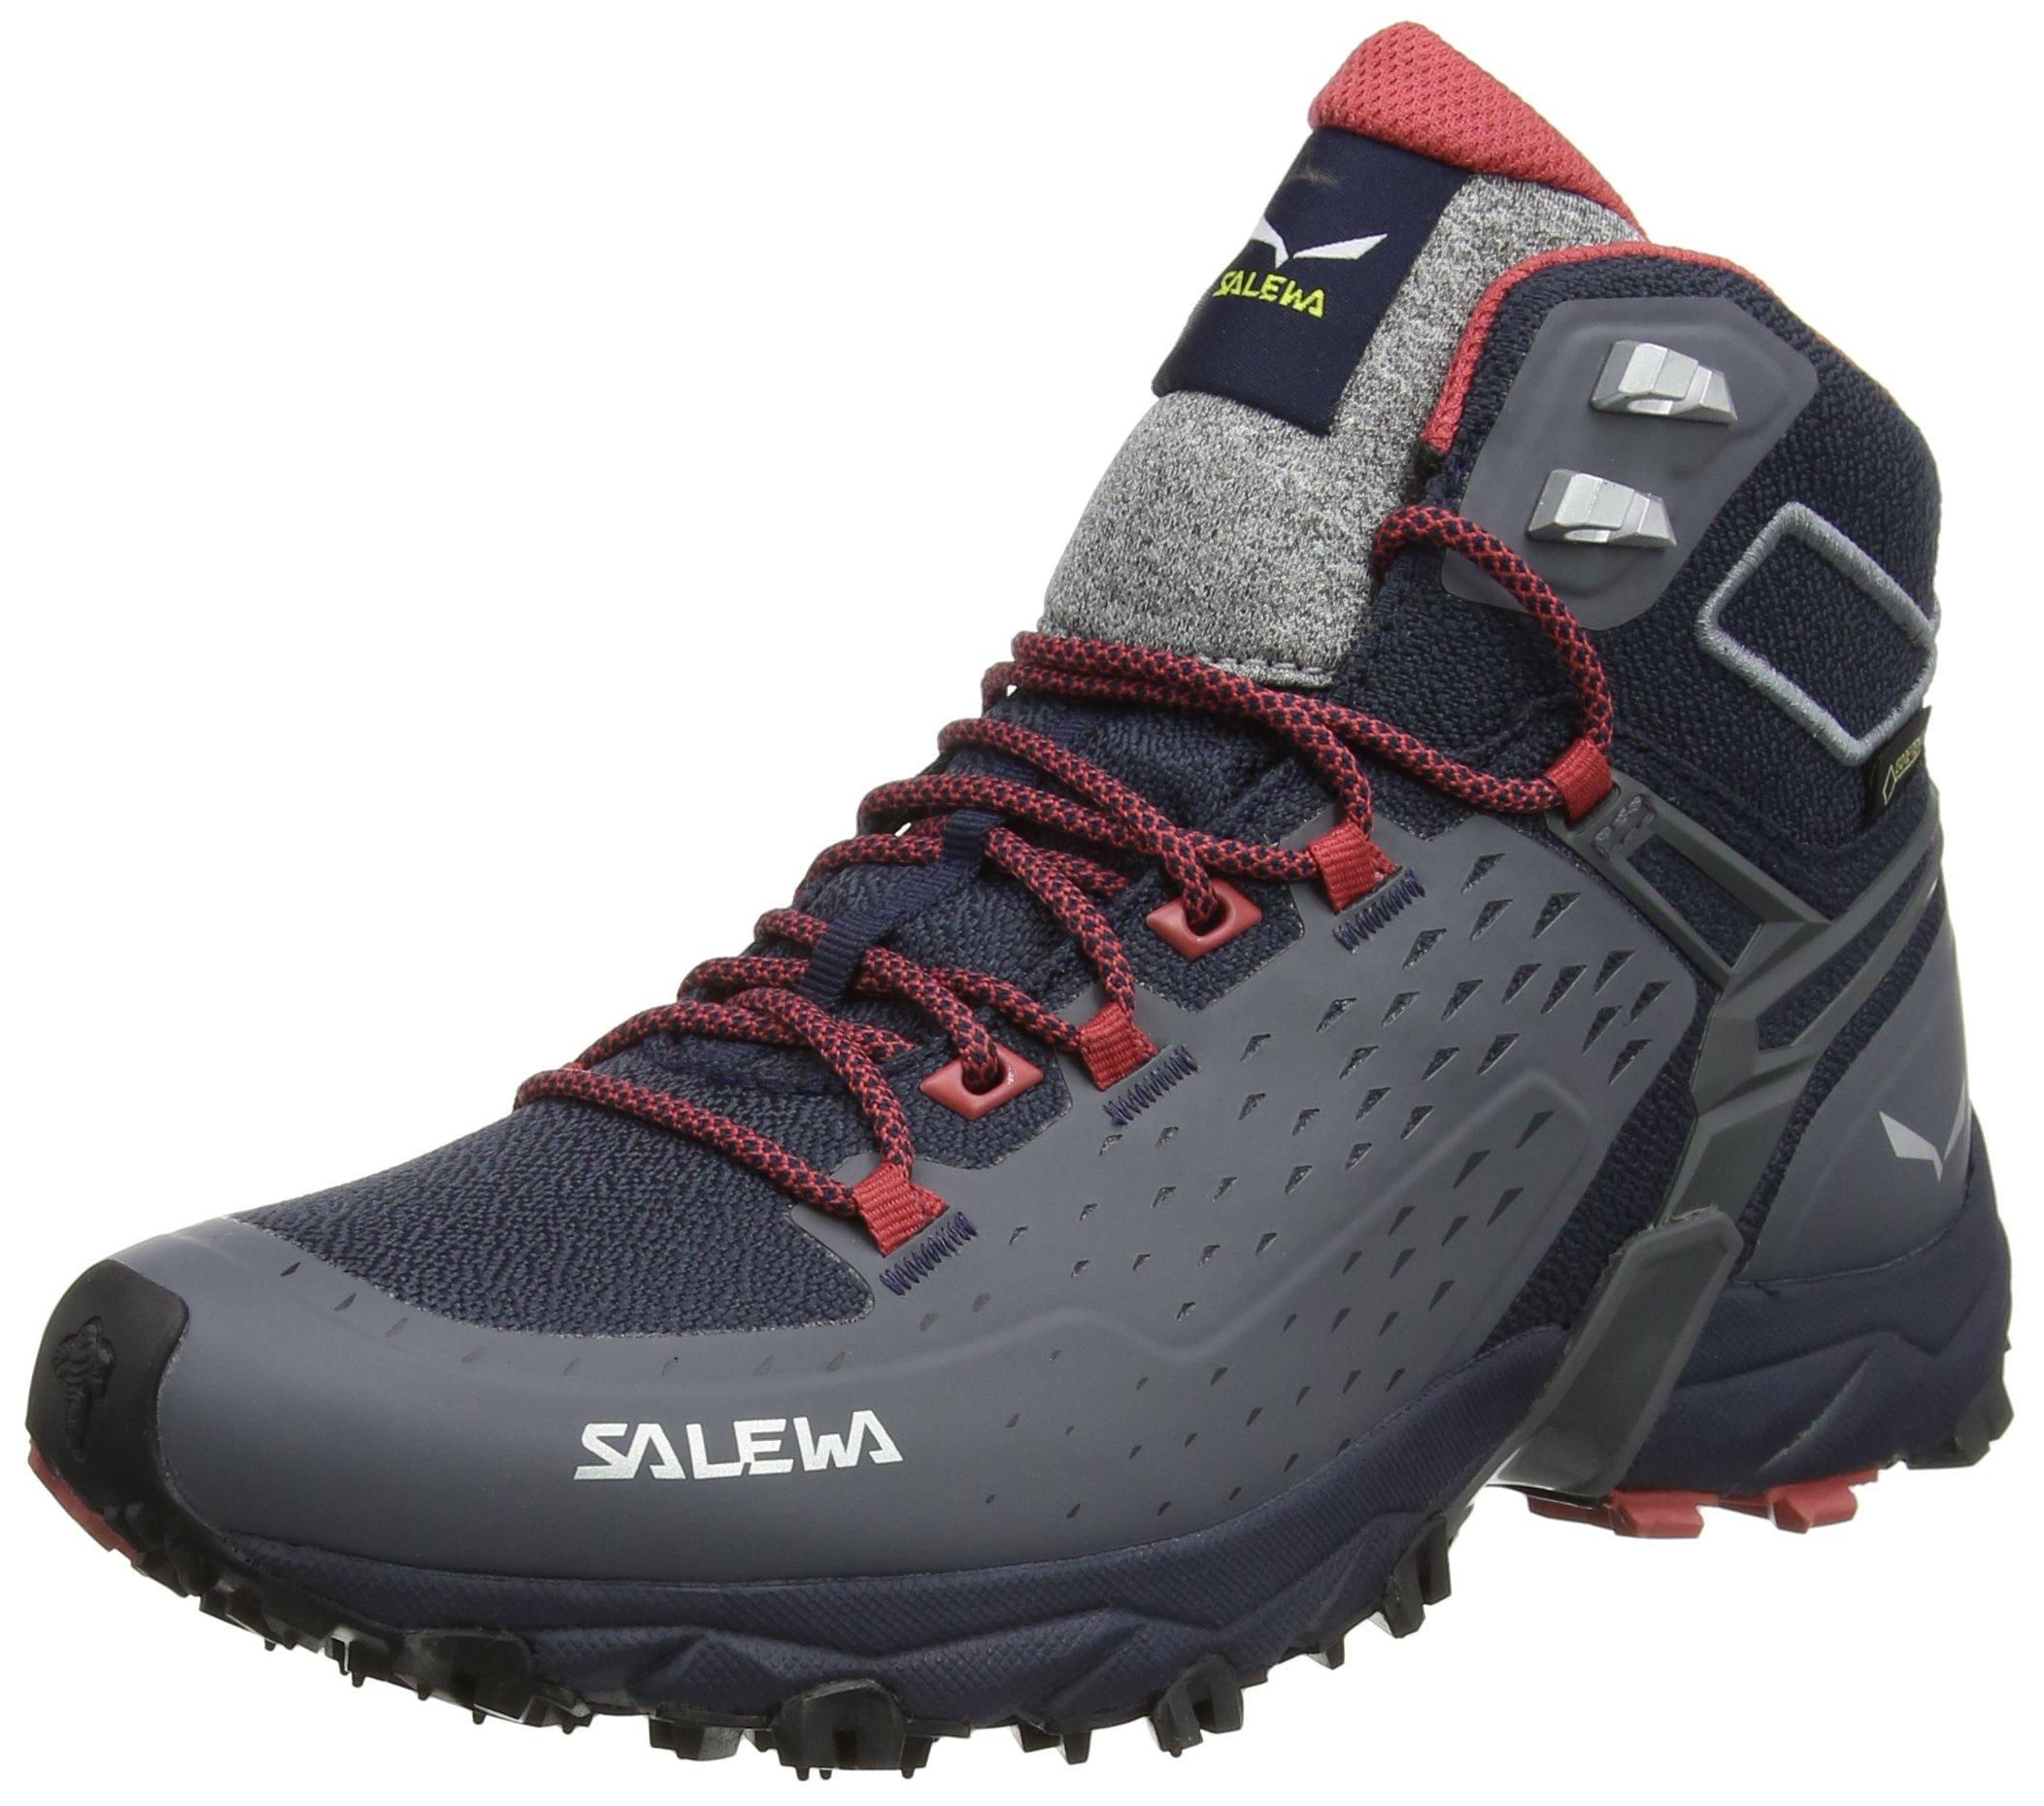 Salewa Women's Alpenrose Ultra Mid GTX Speed Hiking Shoe, Night Black/Mineral Red, 8